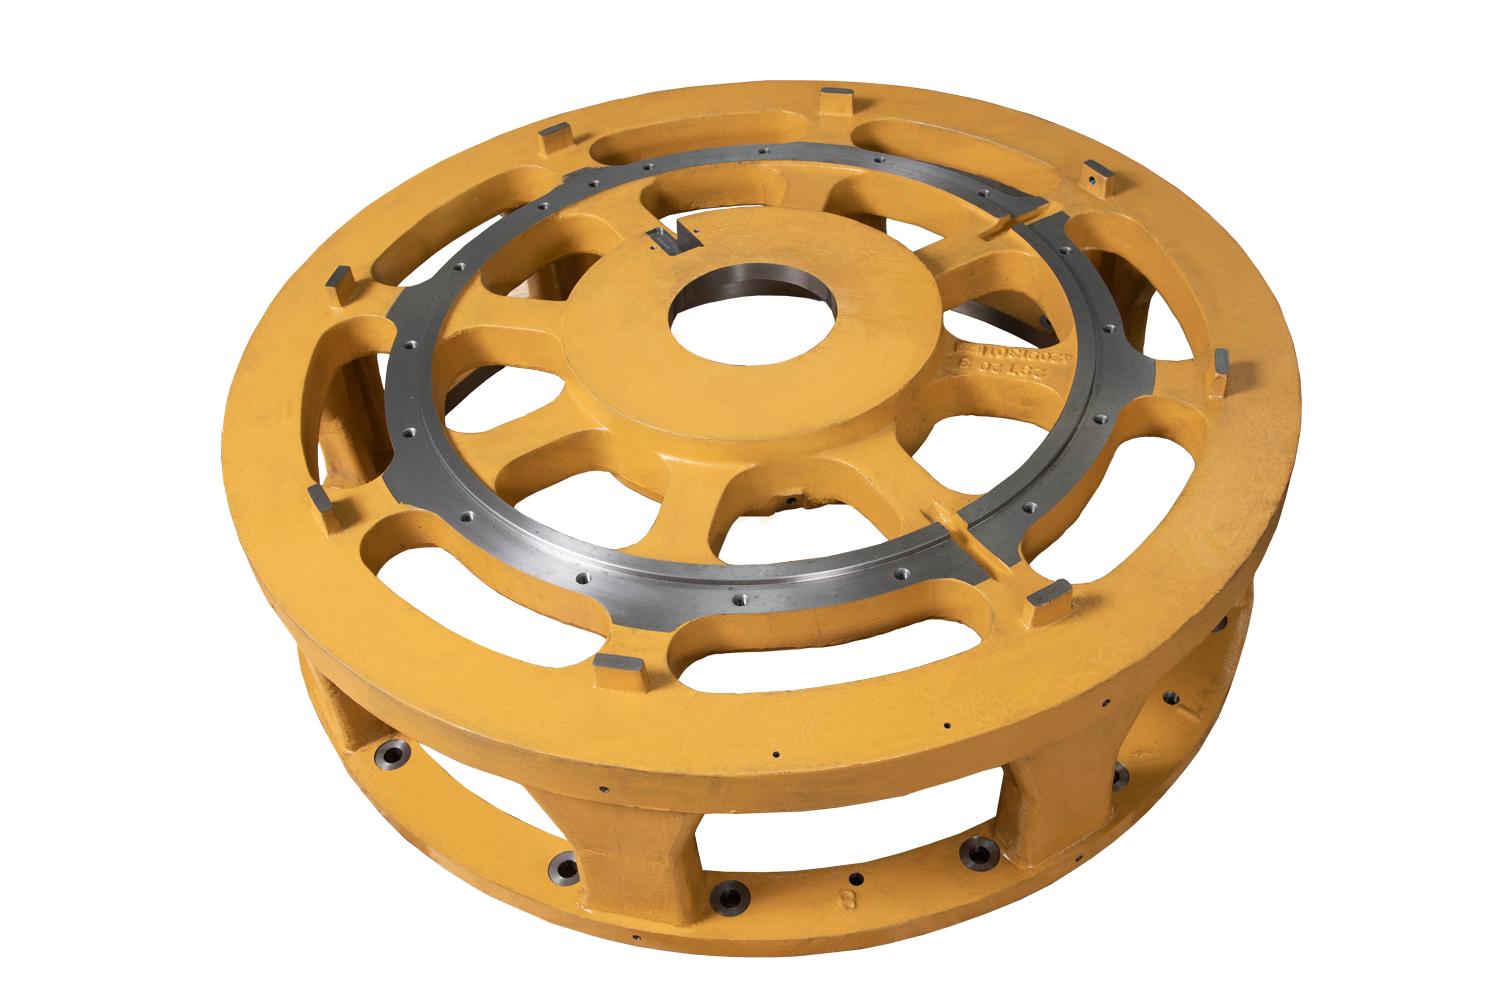 Machined-Gray-Iron-castings-03-C-TPAT_2